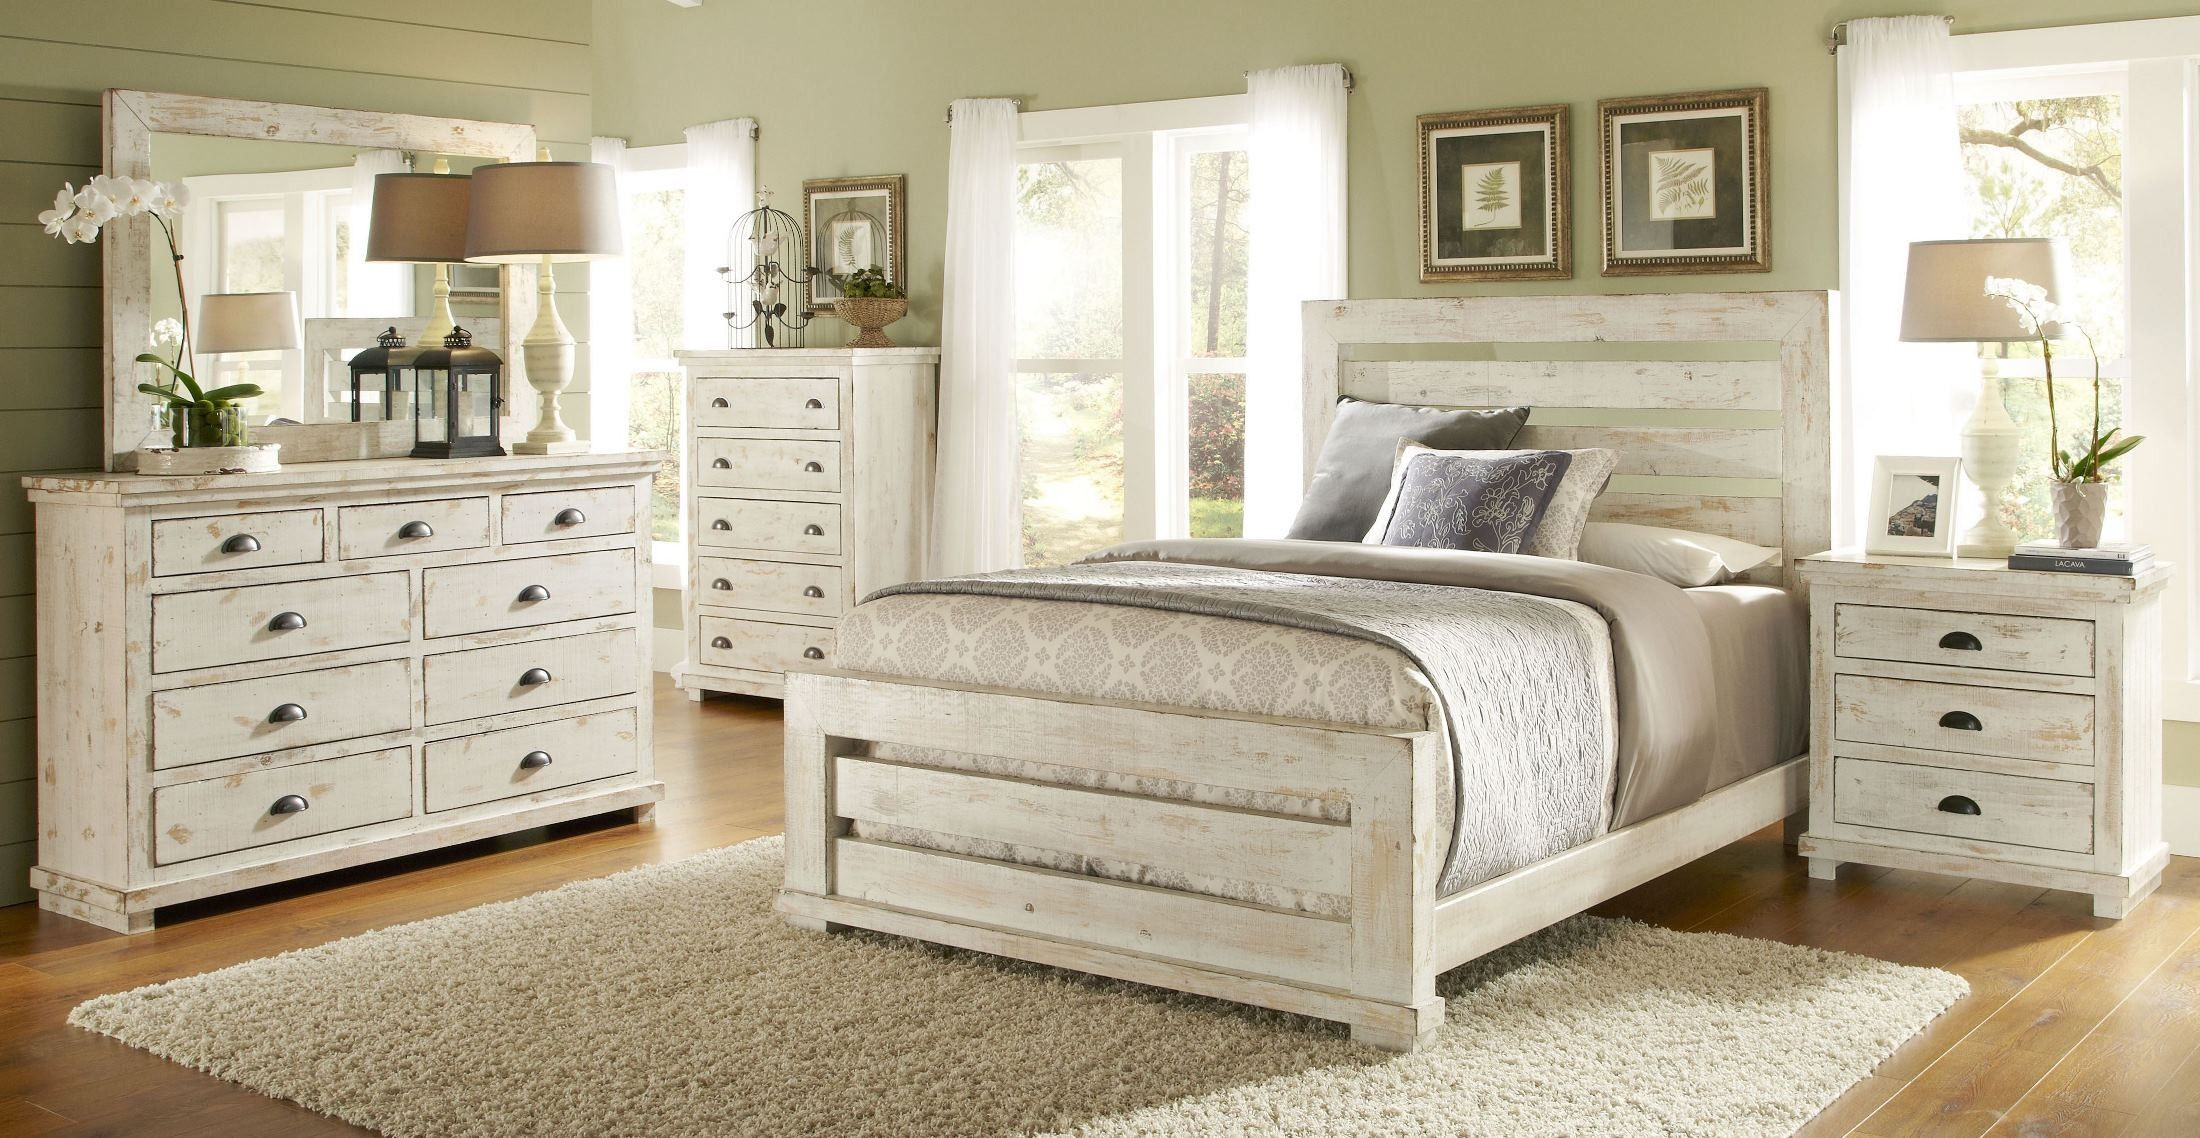 Willow Distressed White Slat Bedroom Set Distressed White